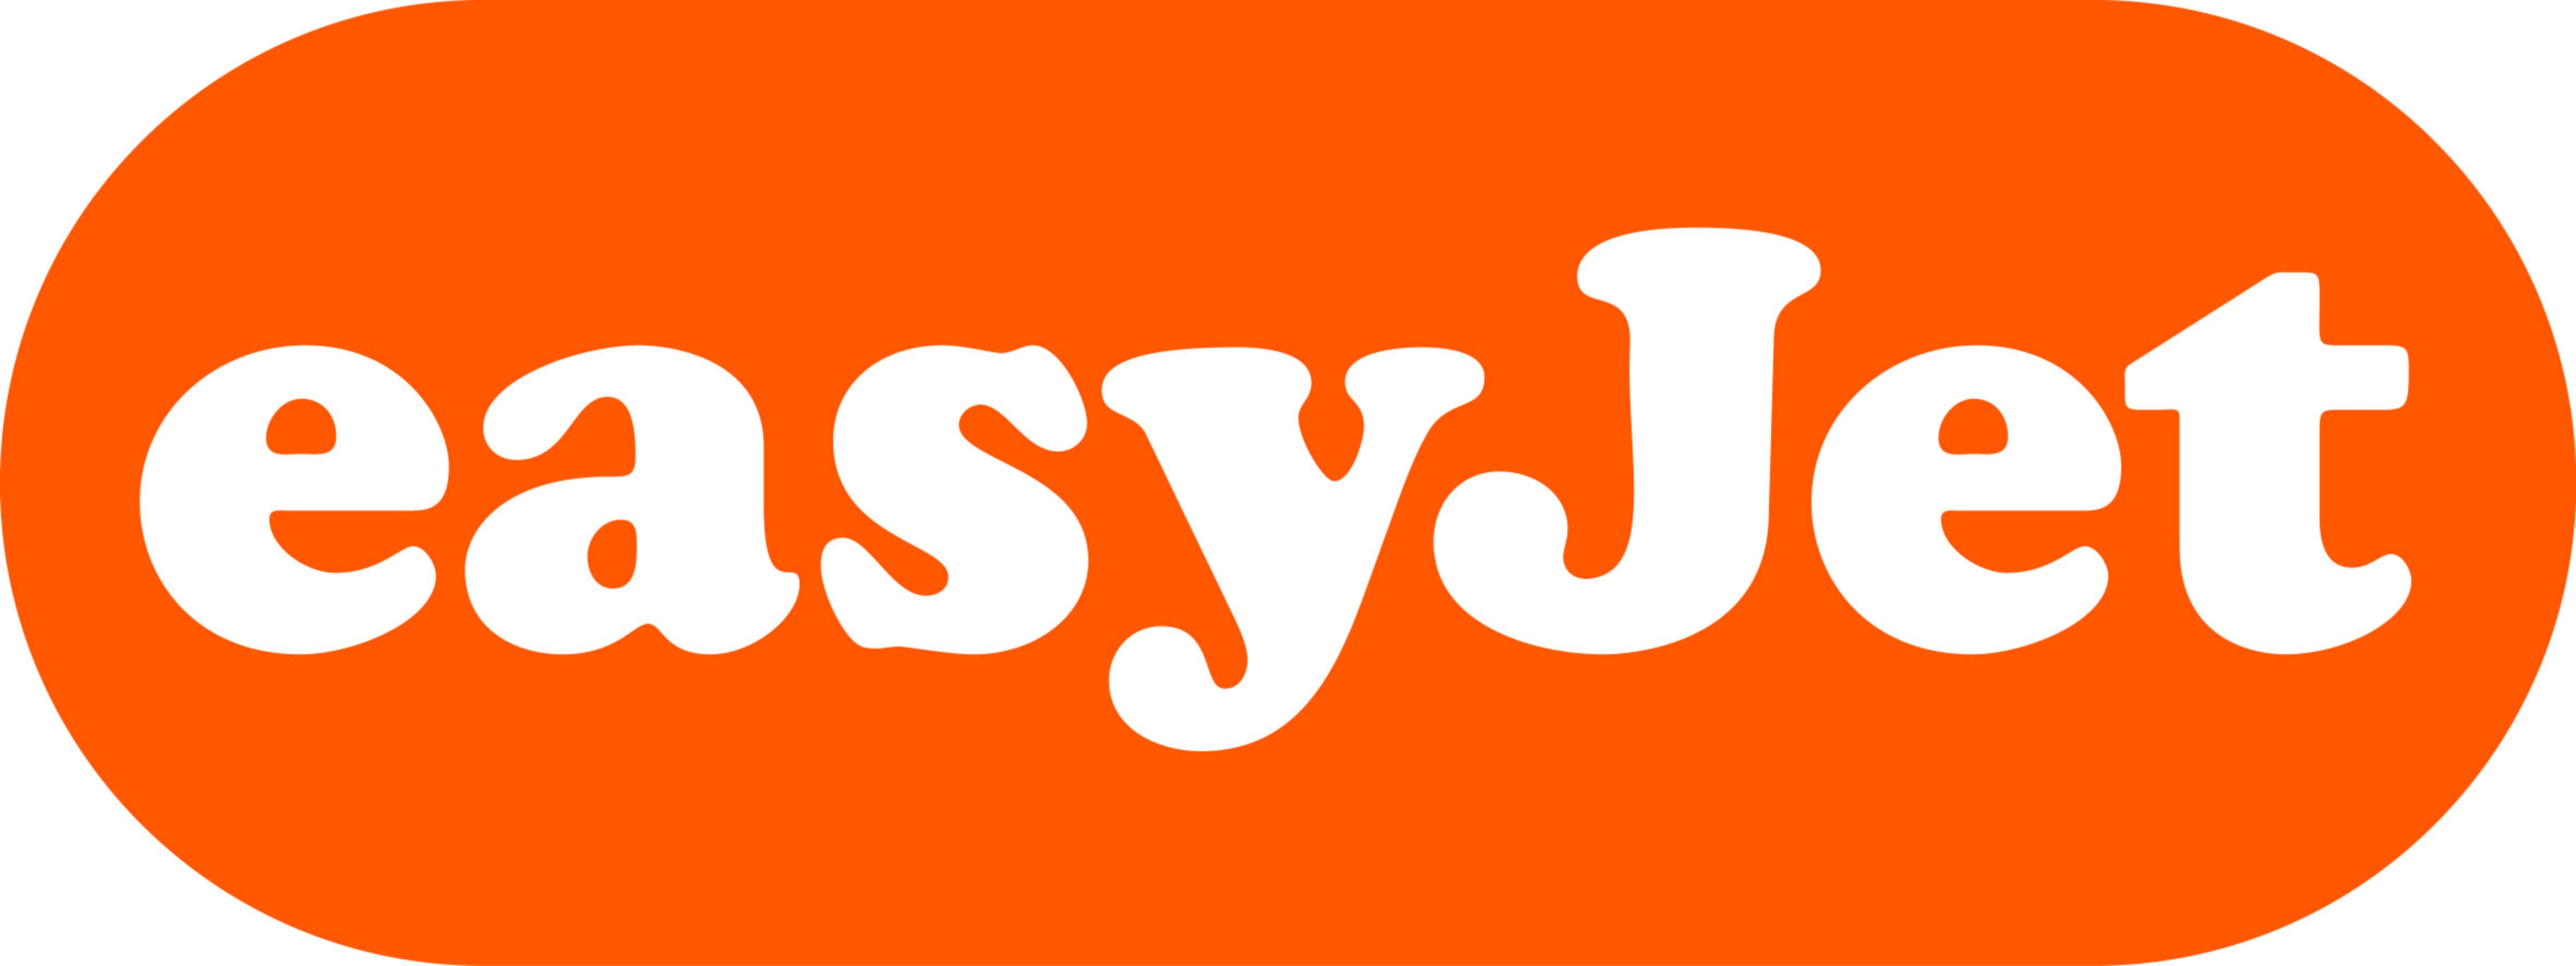 typologo